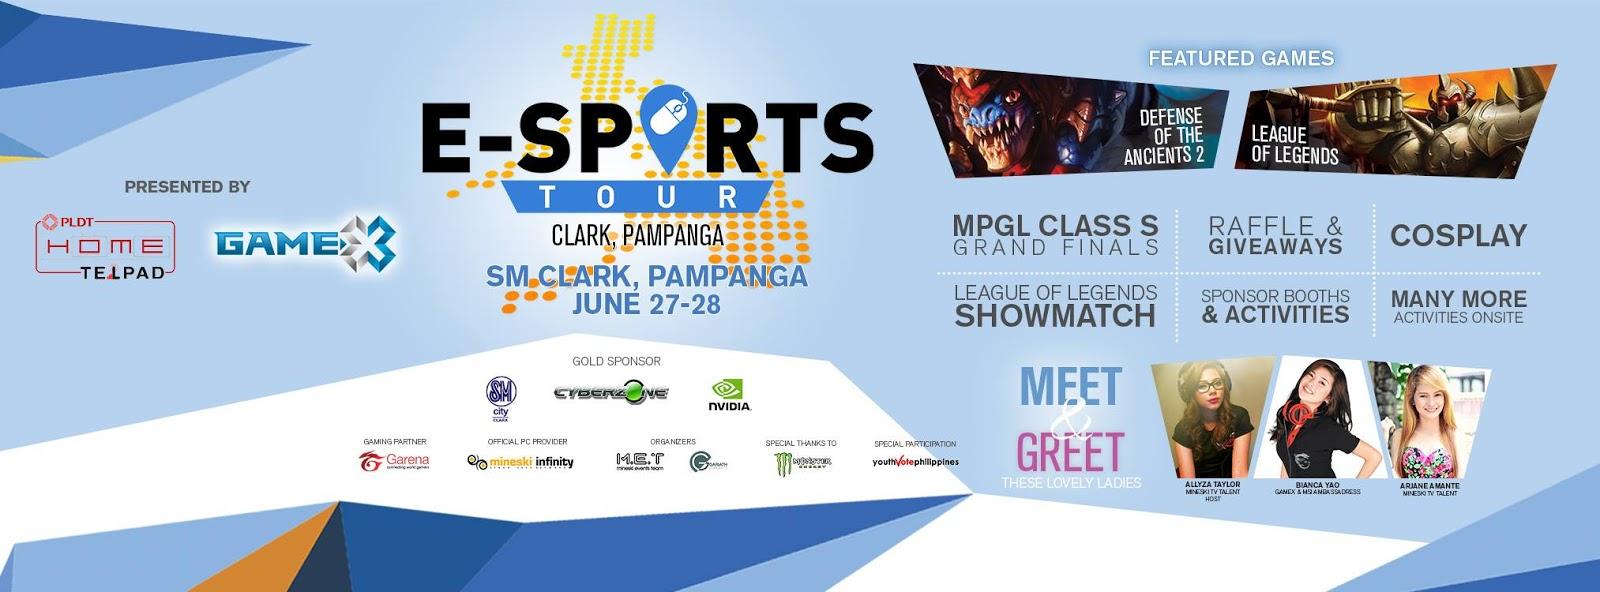 E-Sports Tour 2015